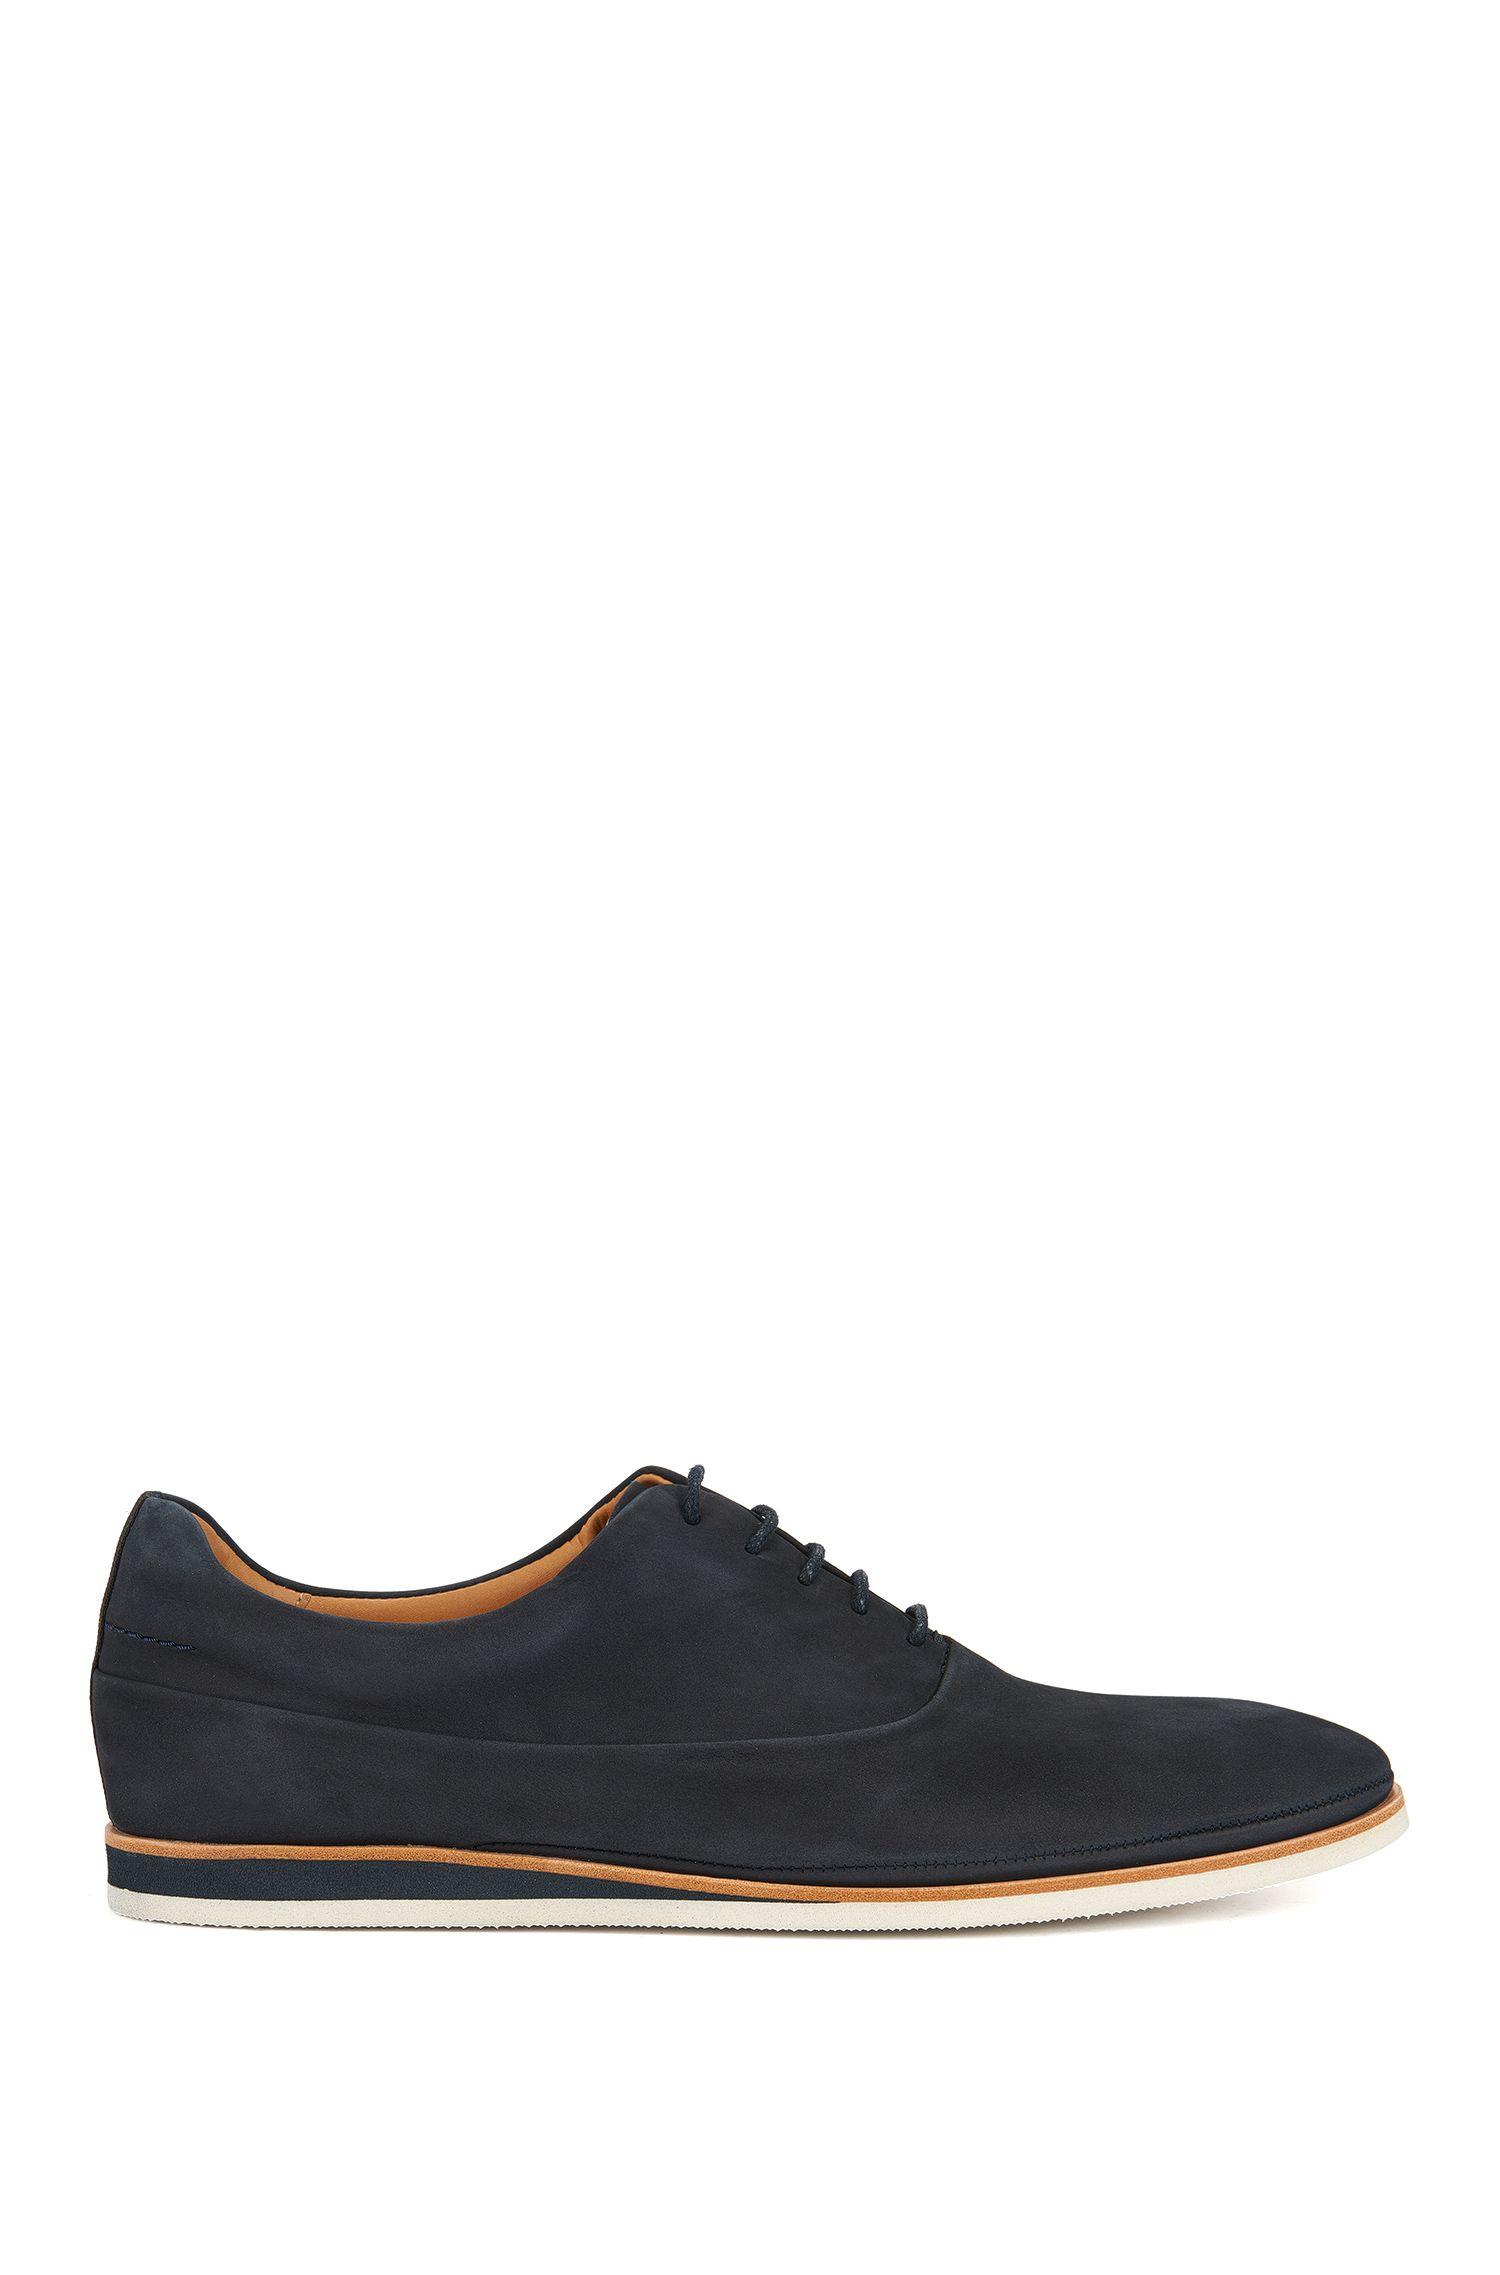 Chaussures Oxford casual en nubuck doux